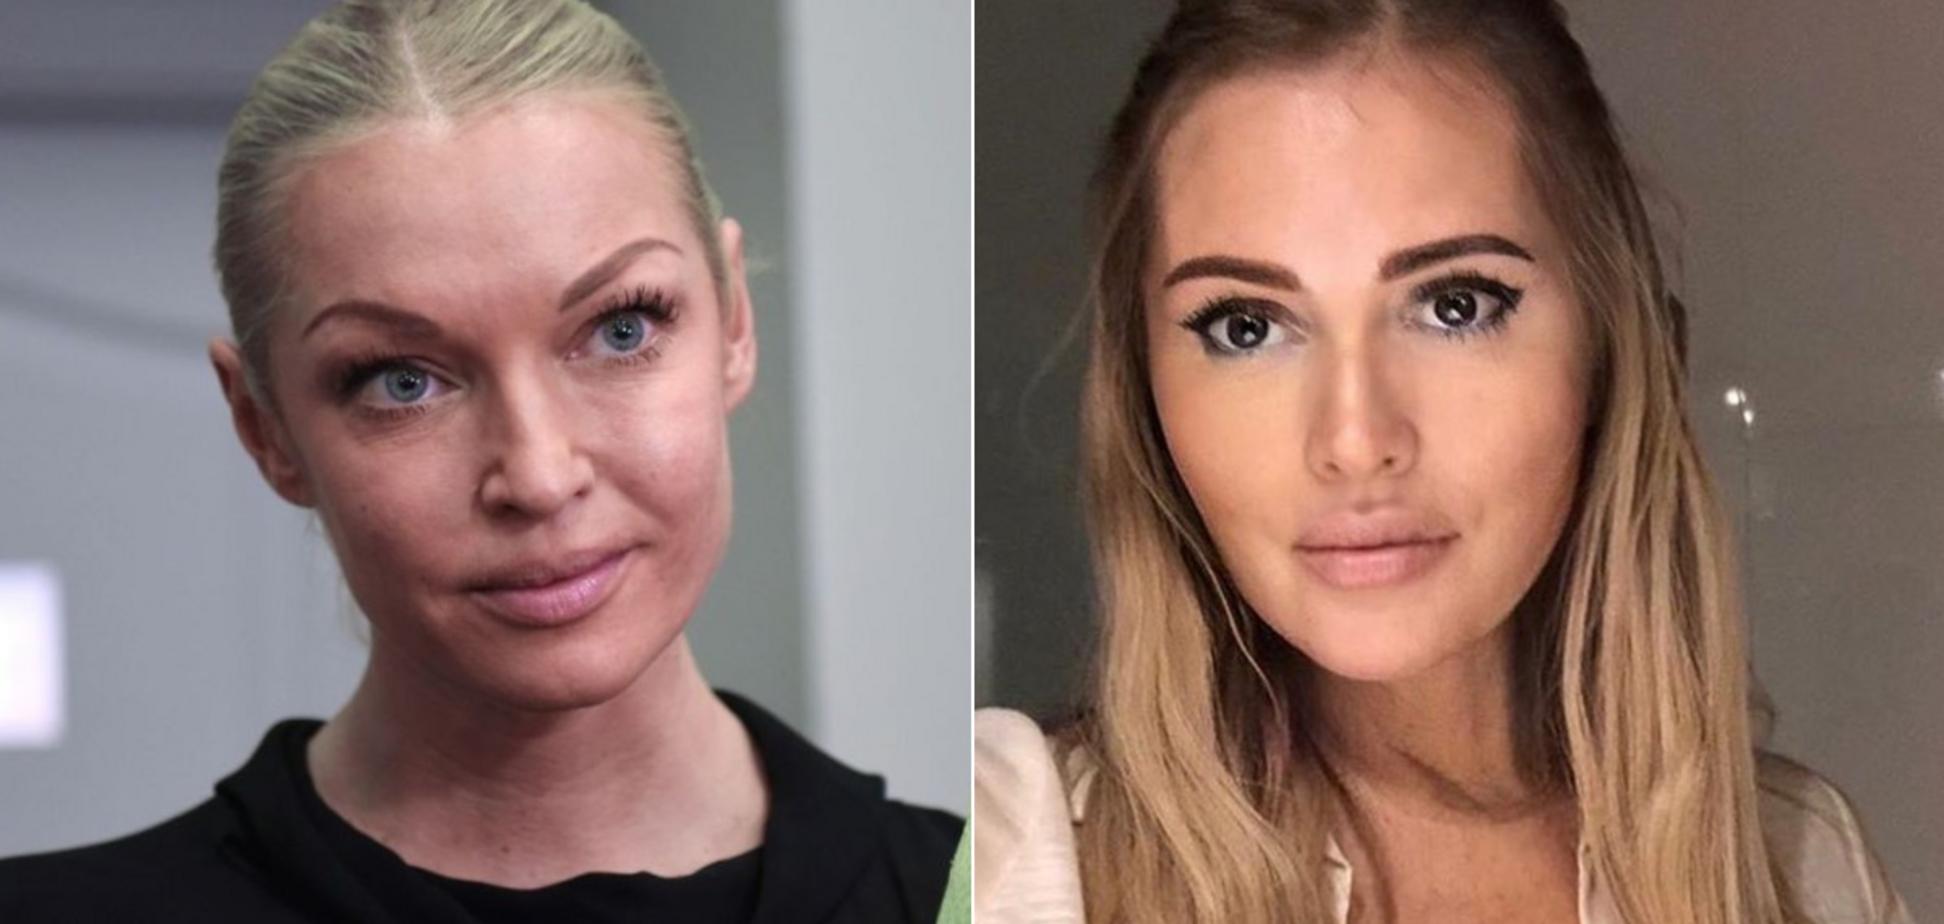 Борисова унизила Волочкову после скандала о зависимости балерины